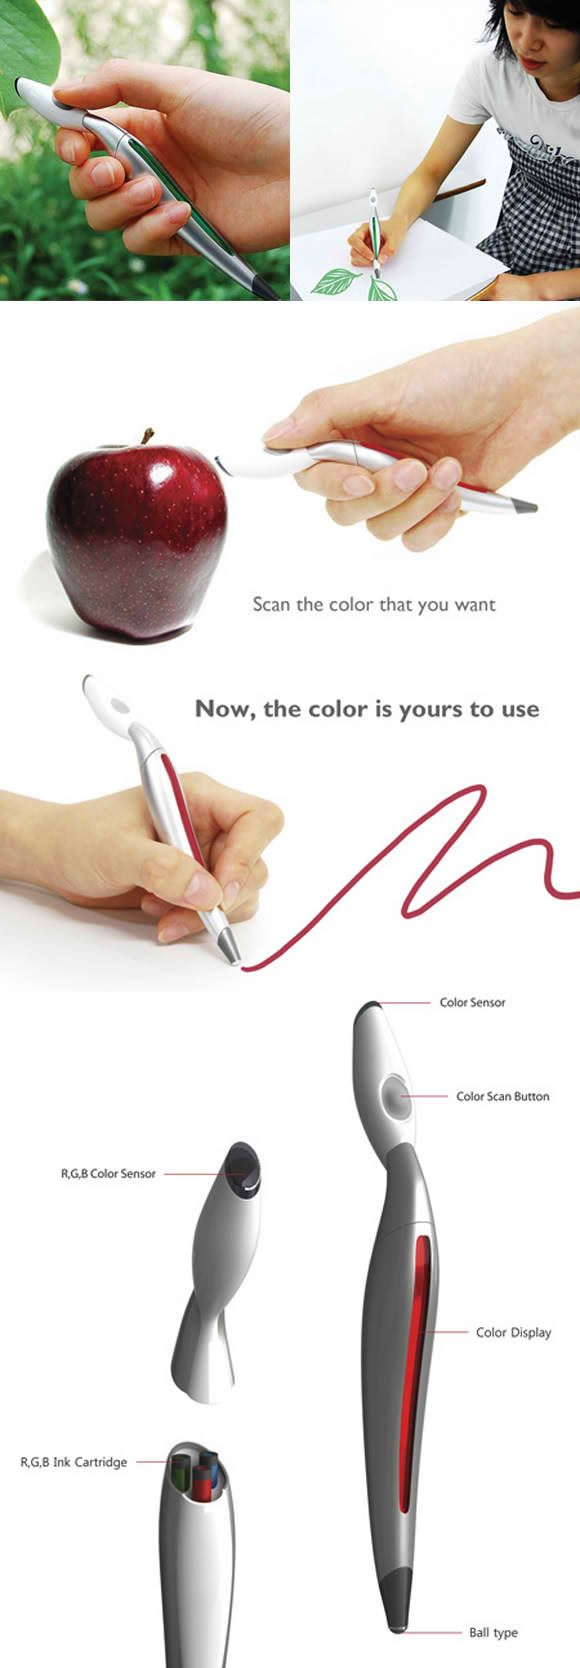 A pen that scans a color and then copies it